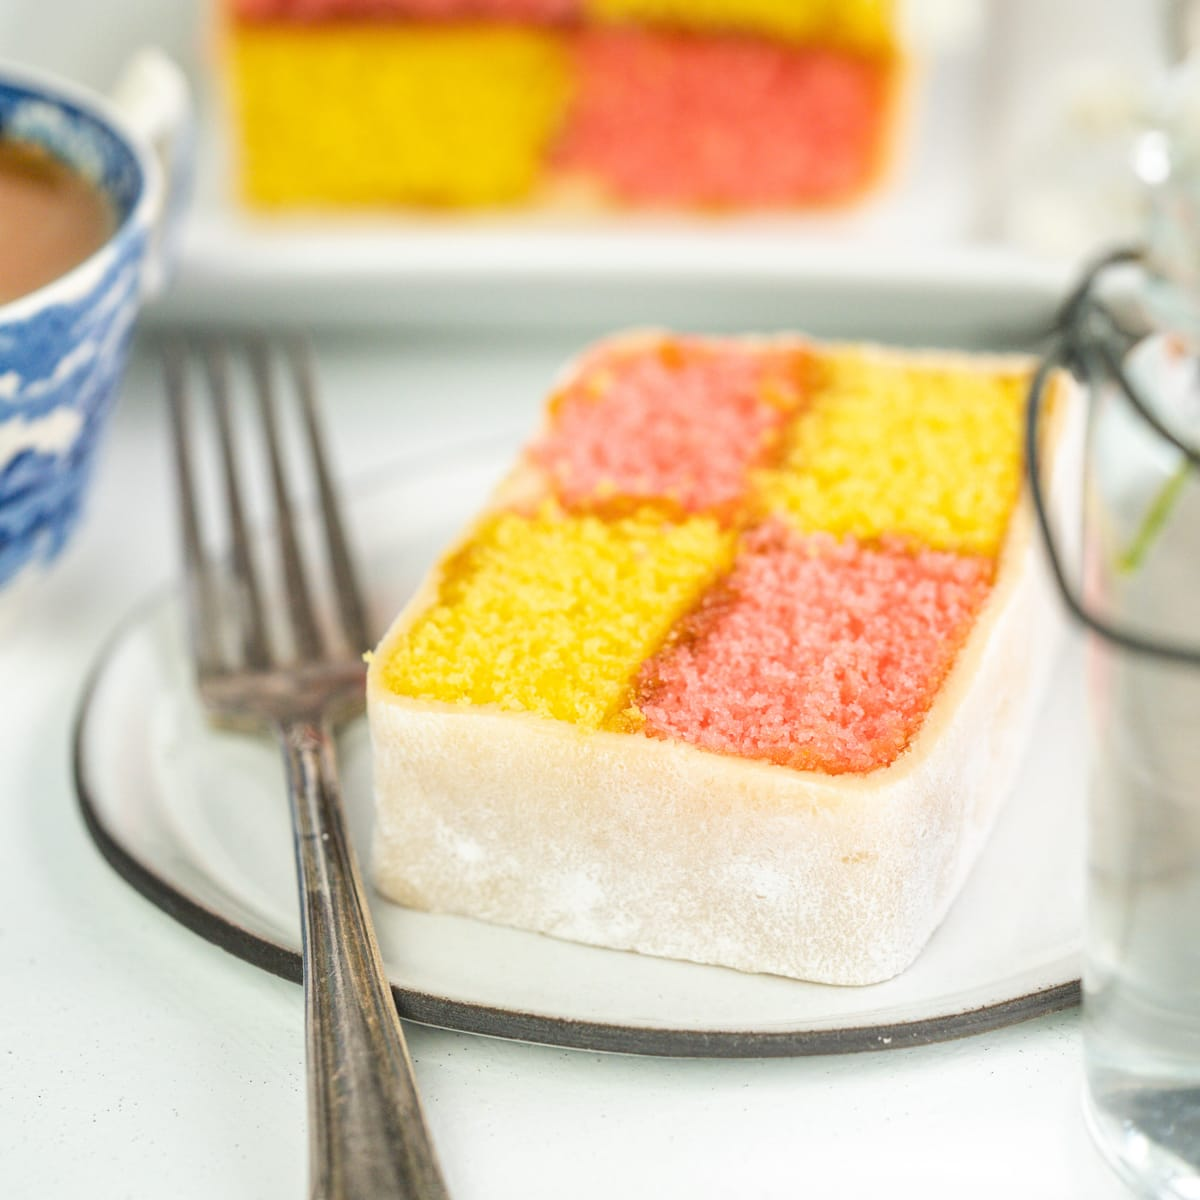 Battenberg cake slice on a plate with a fork on a light background.